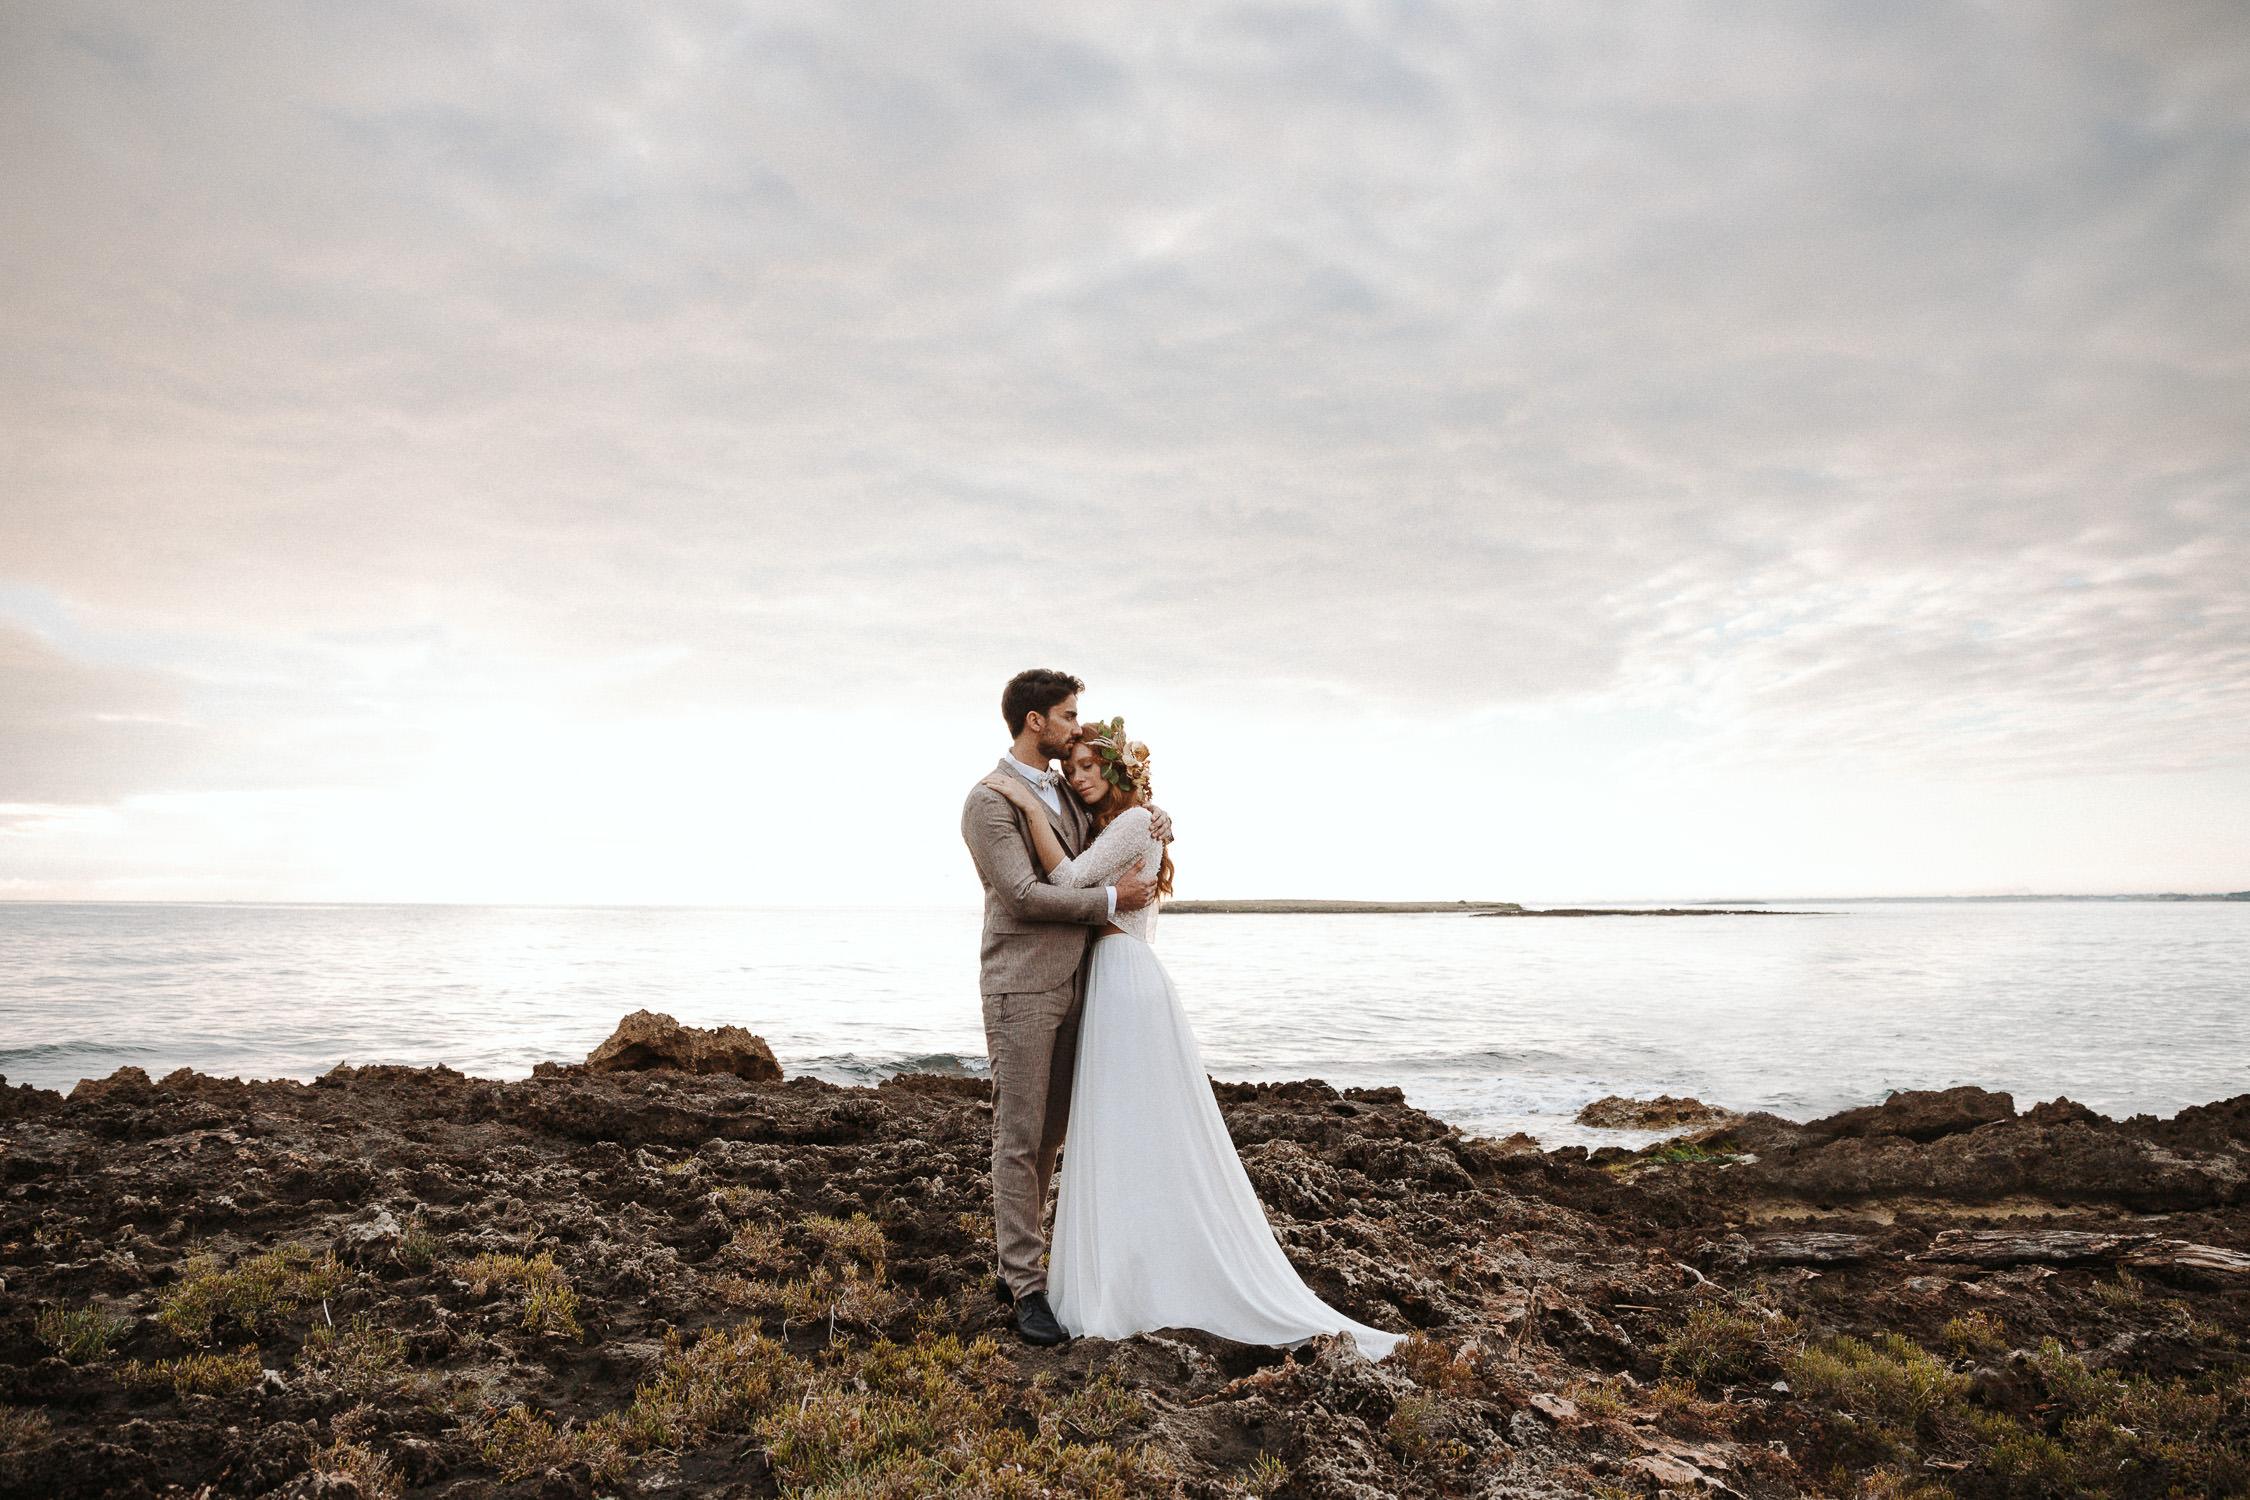 Italy-wedding-photographer-style02